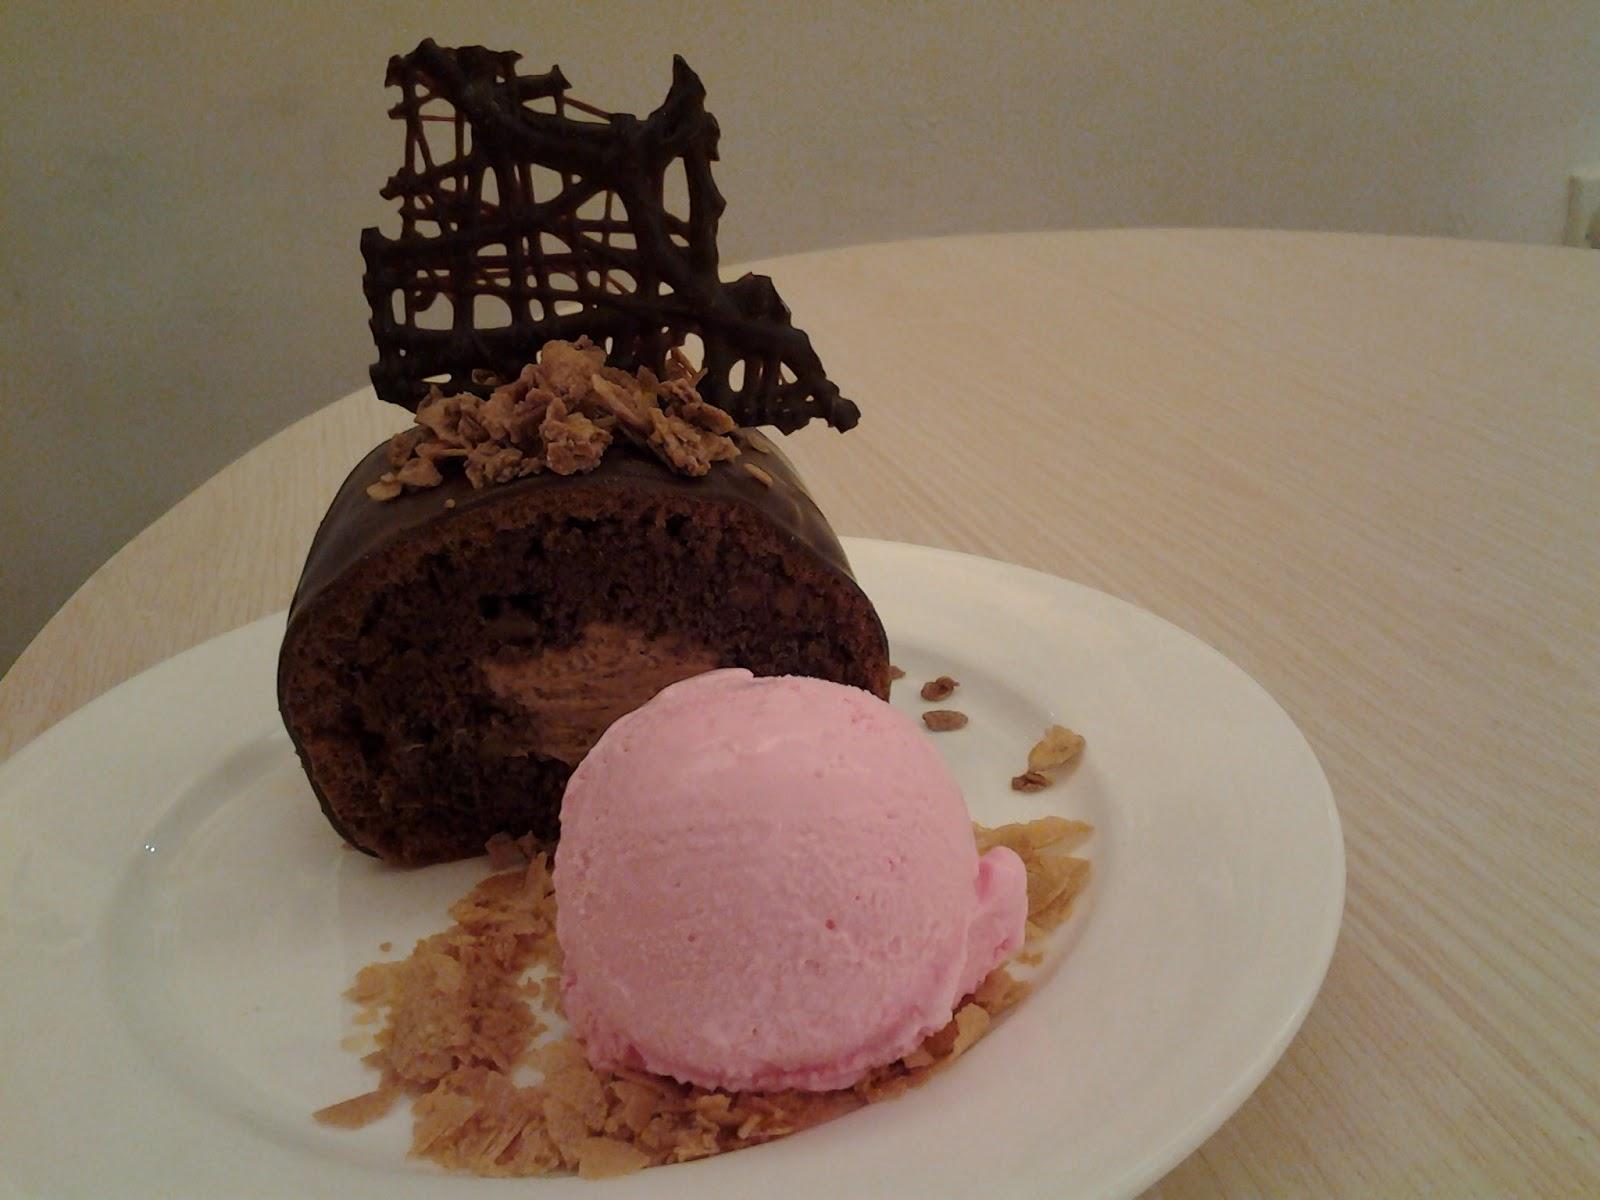 Resep Banana Cake Ala Jepang: Inspirasikukeni: Rati Rati, Bakery Yang Menyajikan Bolu